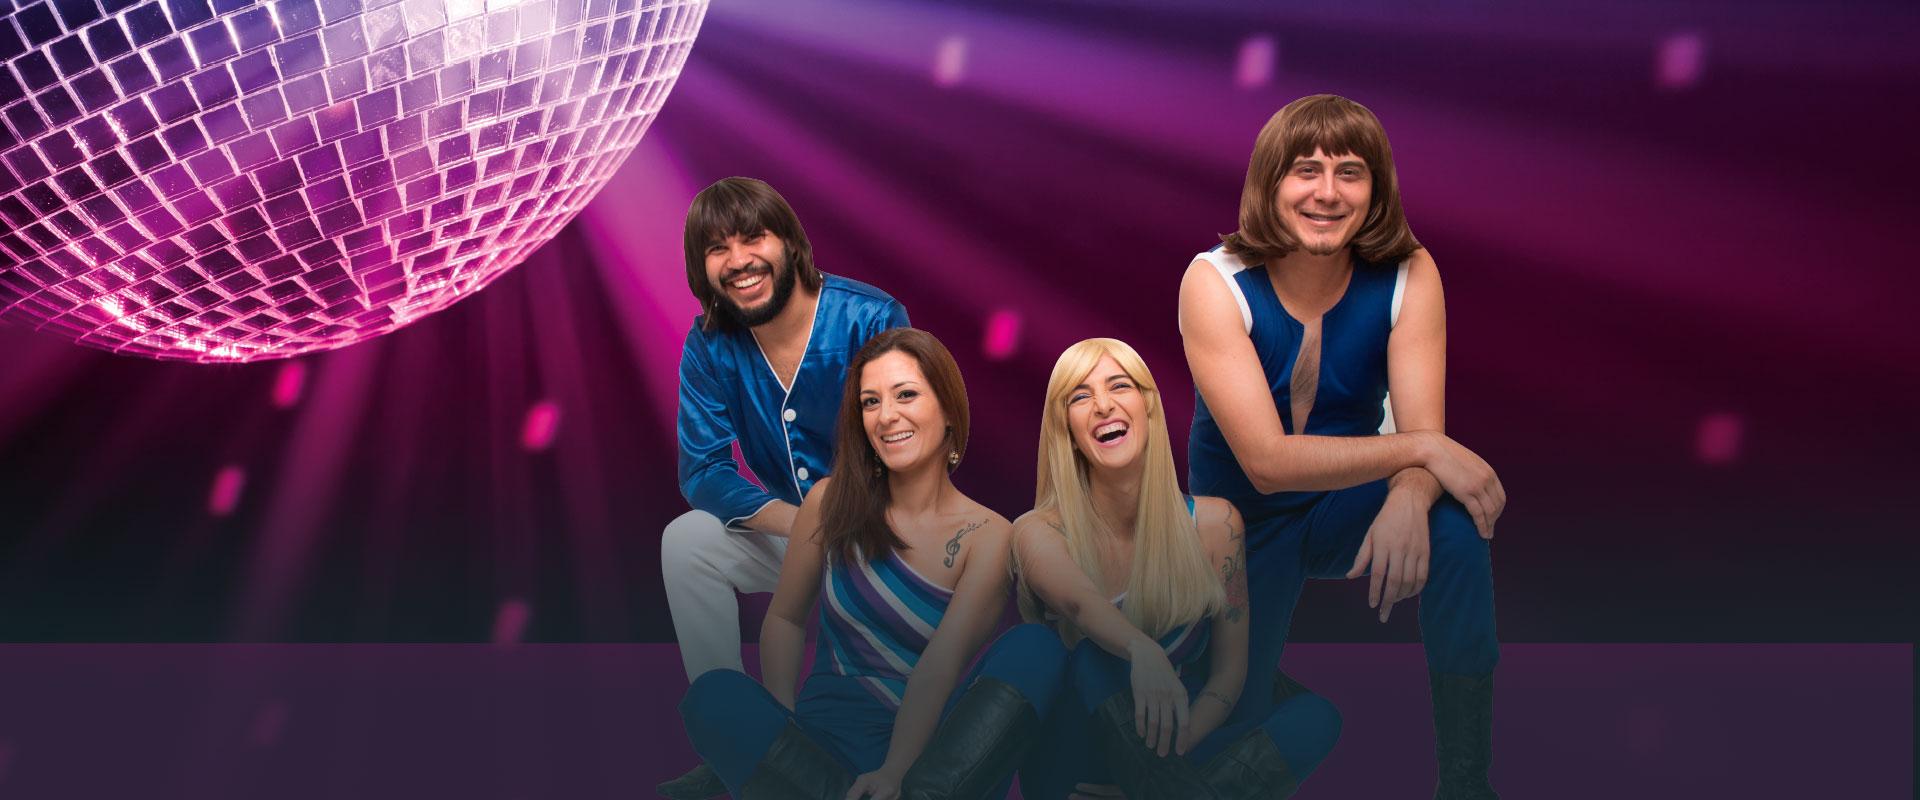 Banner da promoção ABBA The Music